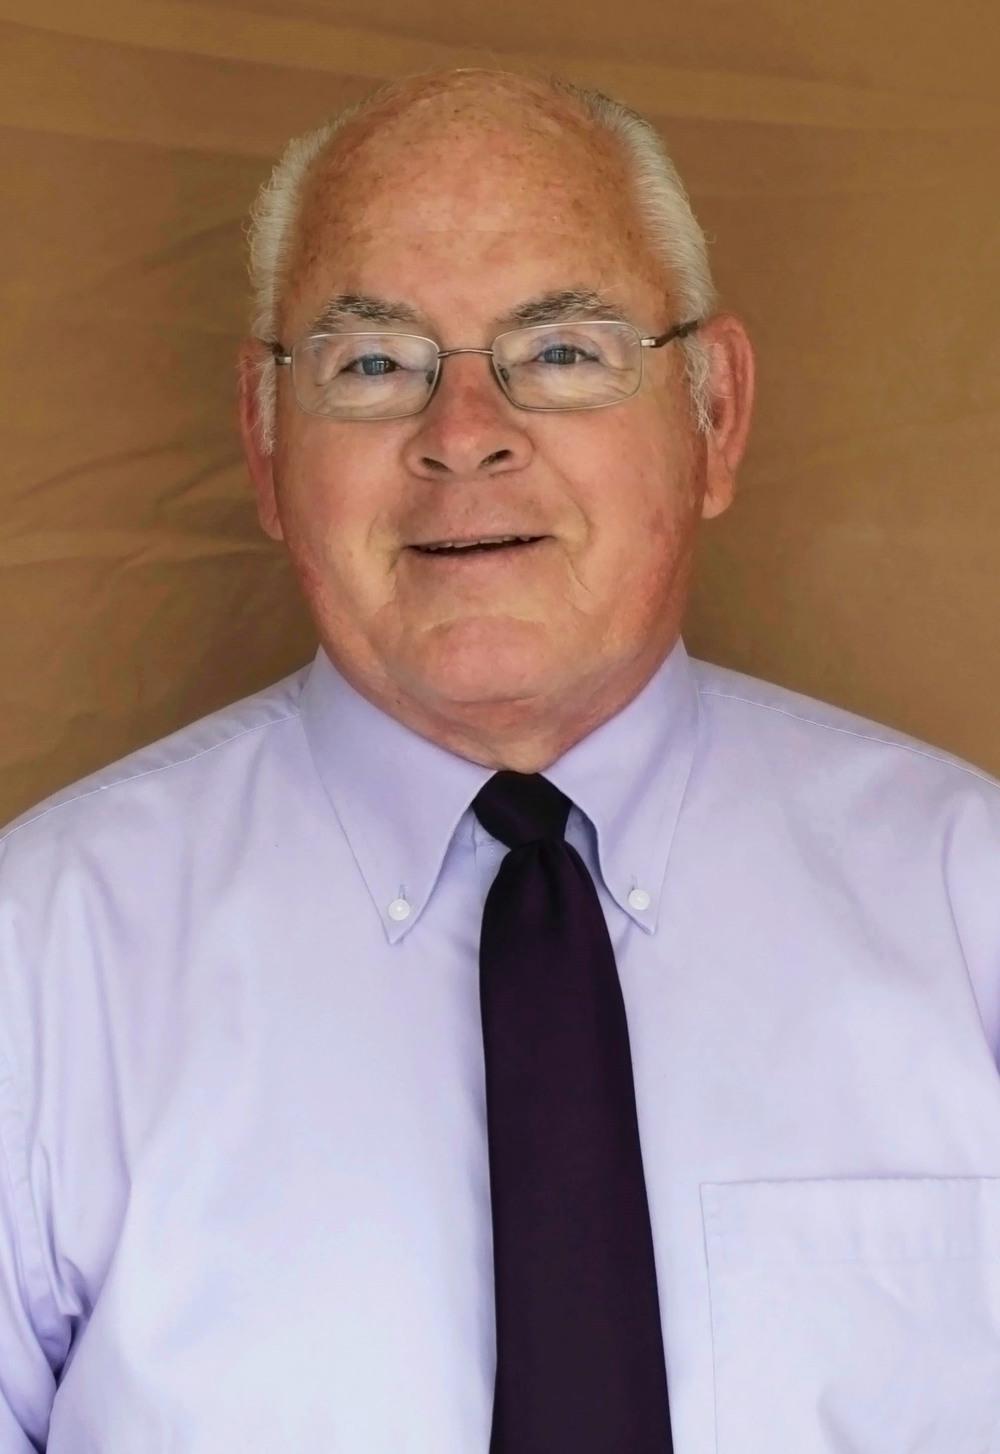 Rev. Paul Martin, M. Div.